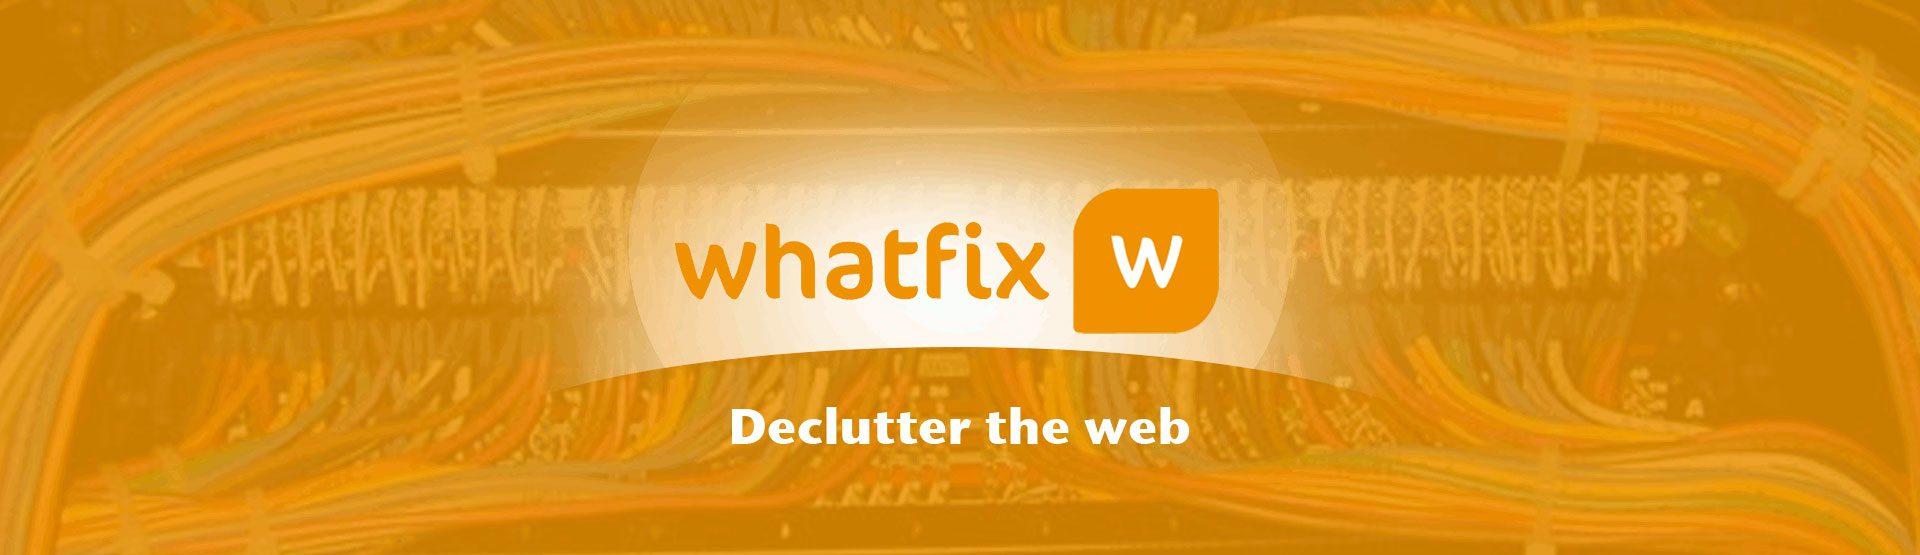 Whatfix #DeclutterTheWeb